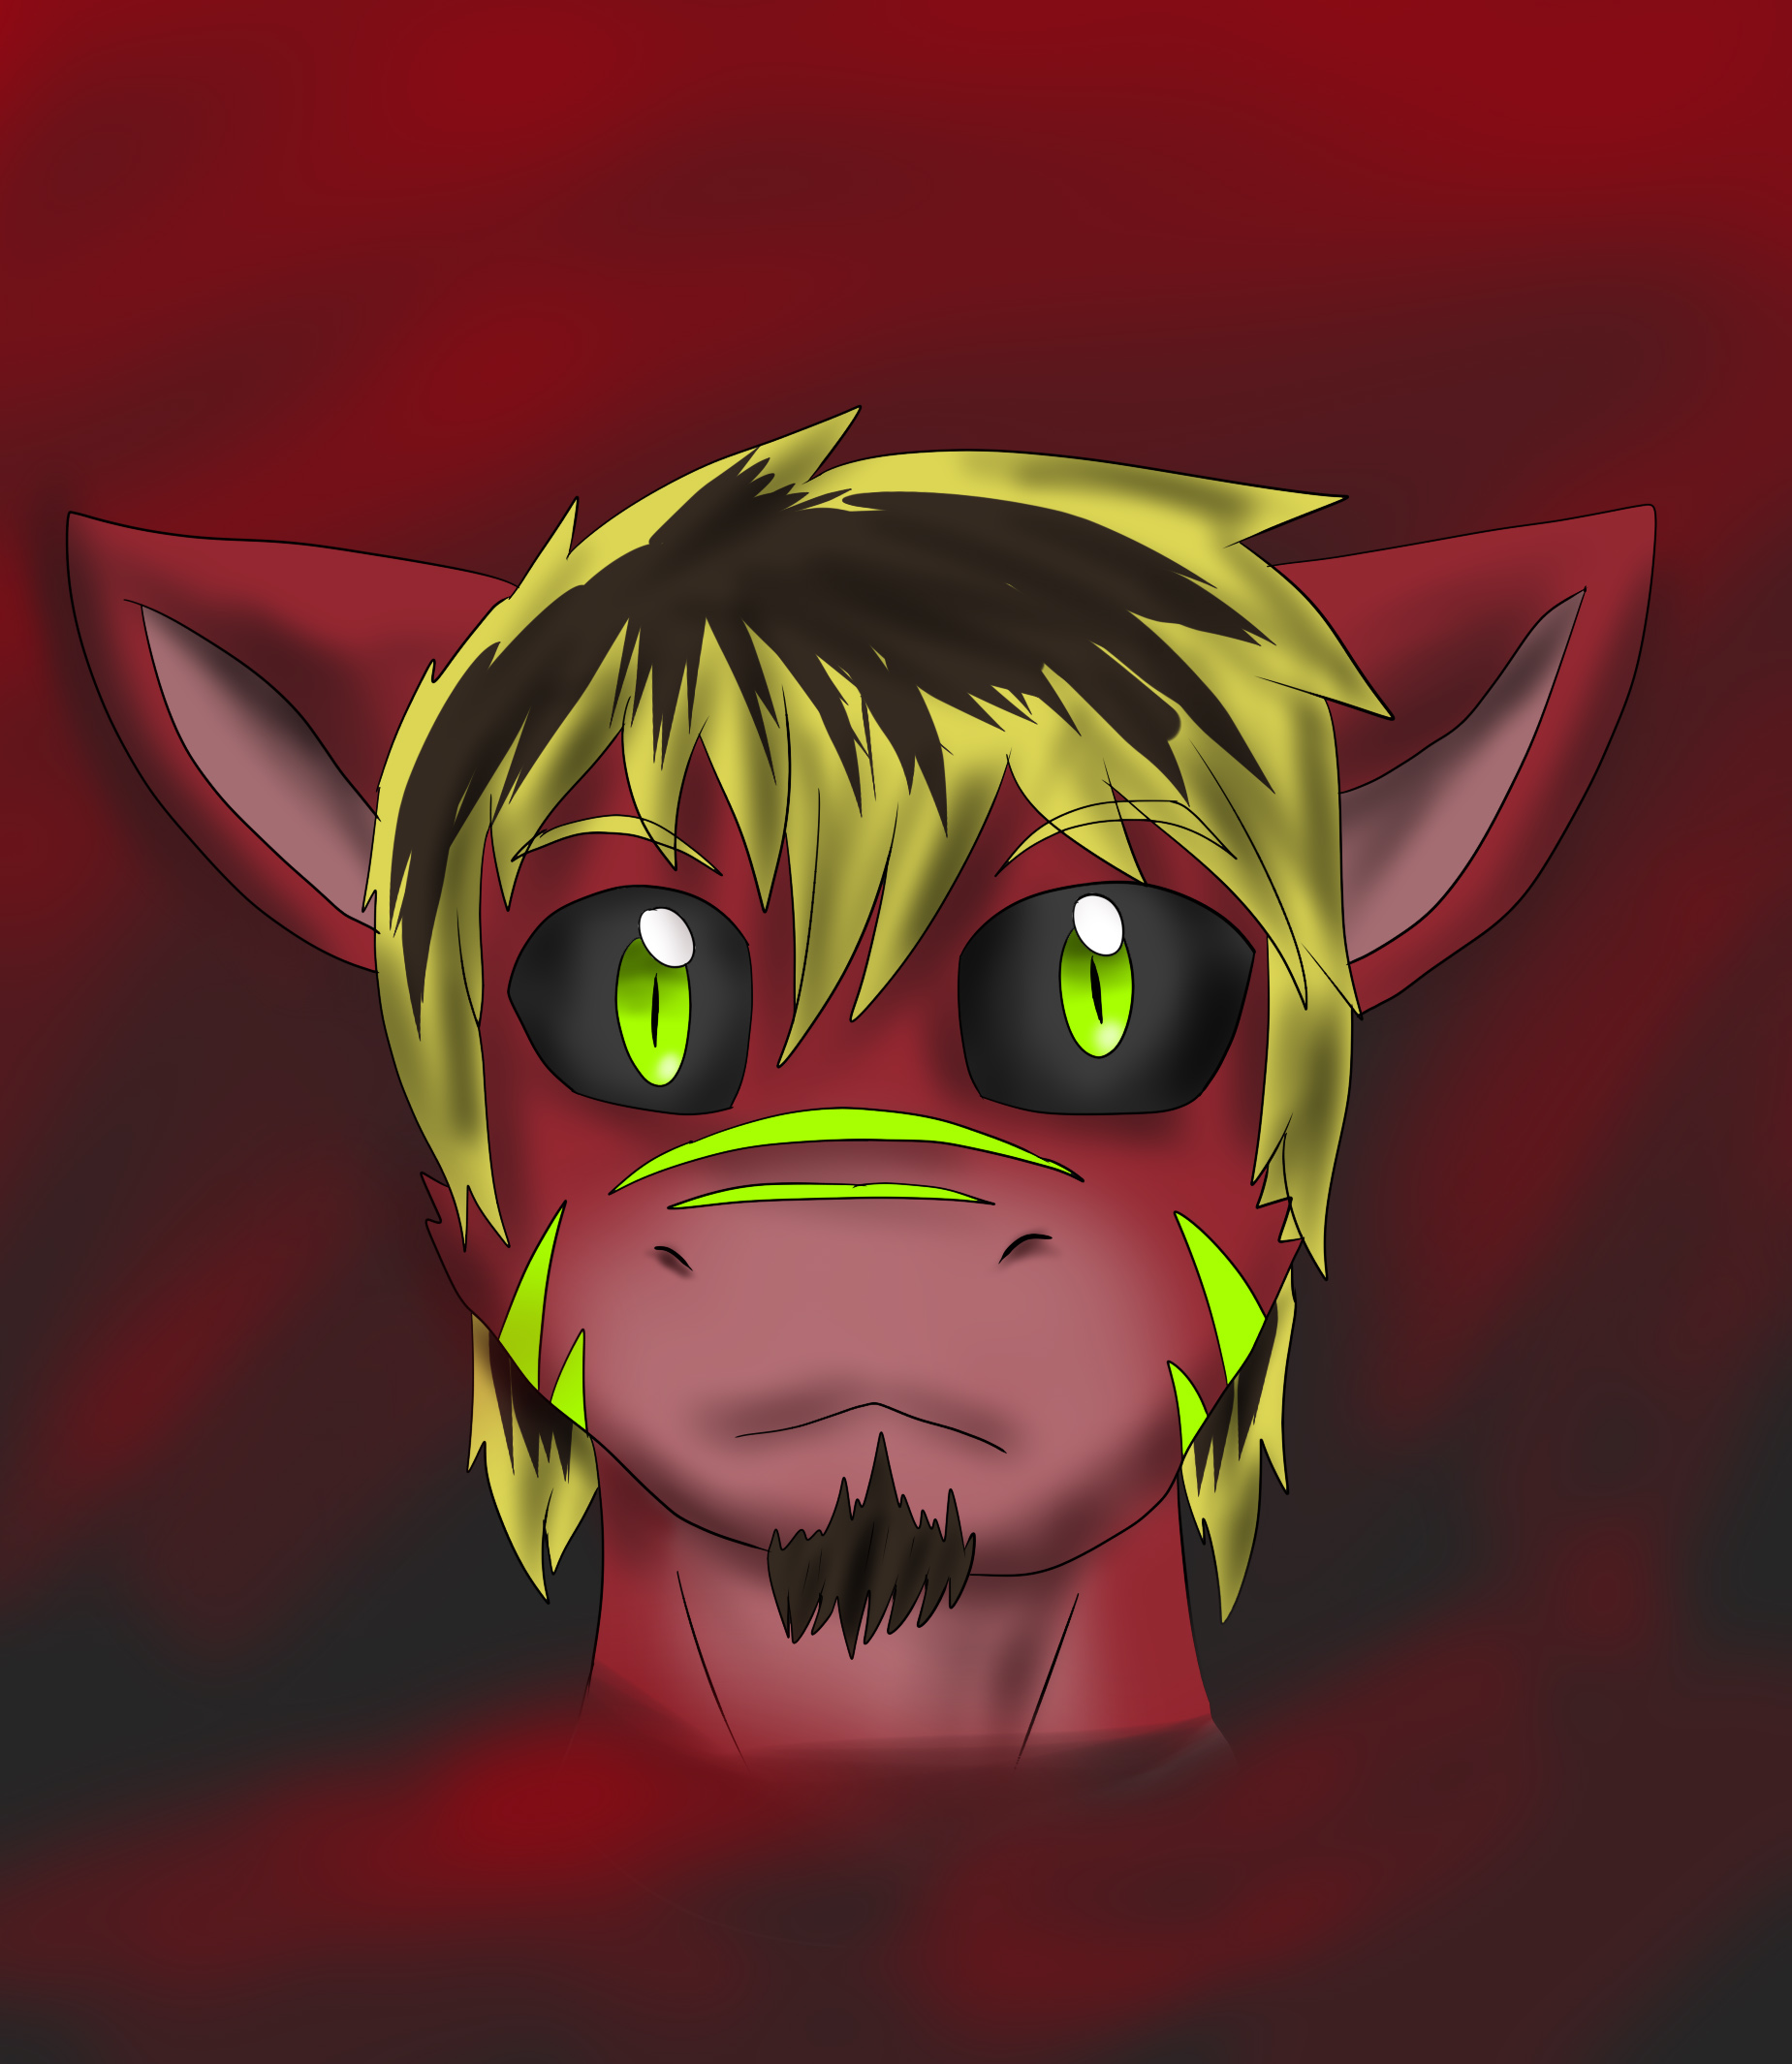 Flameydragwasp's Profile Picture